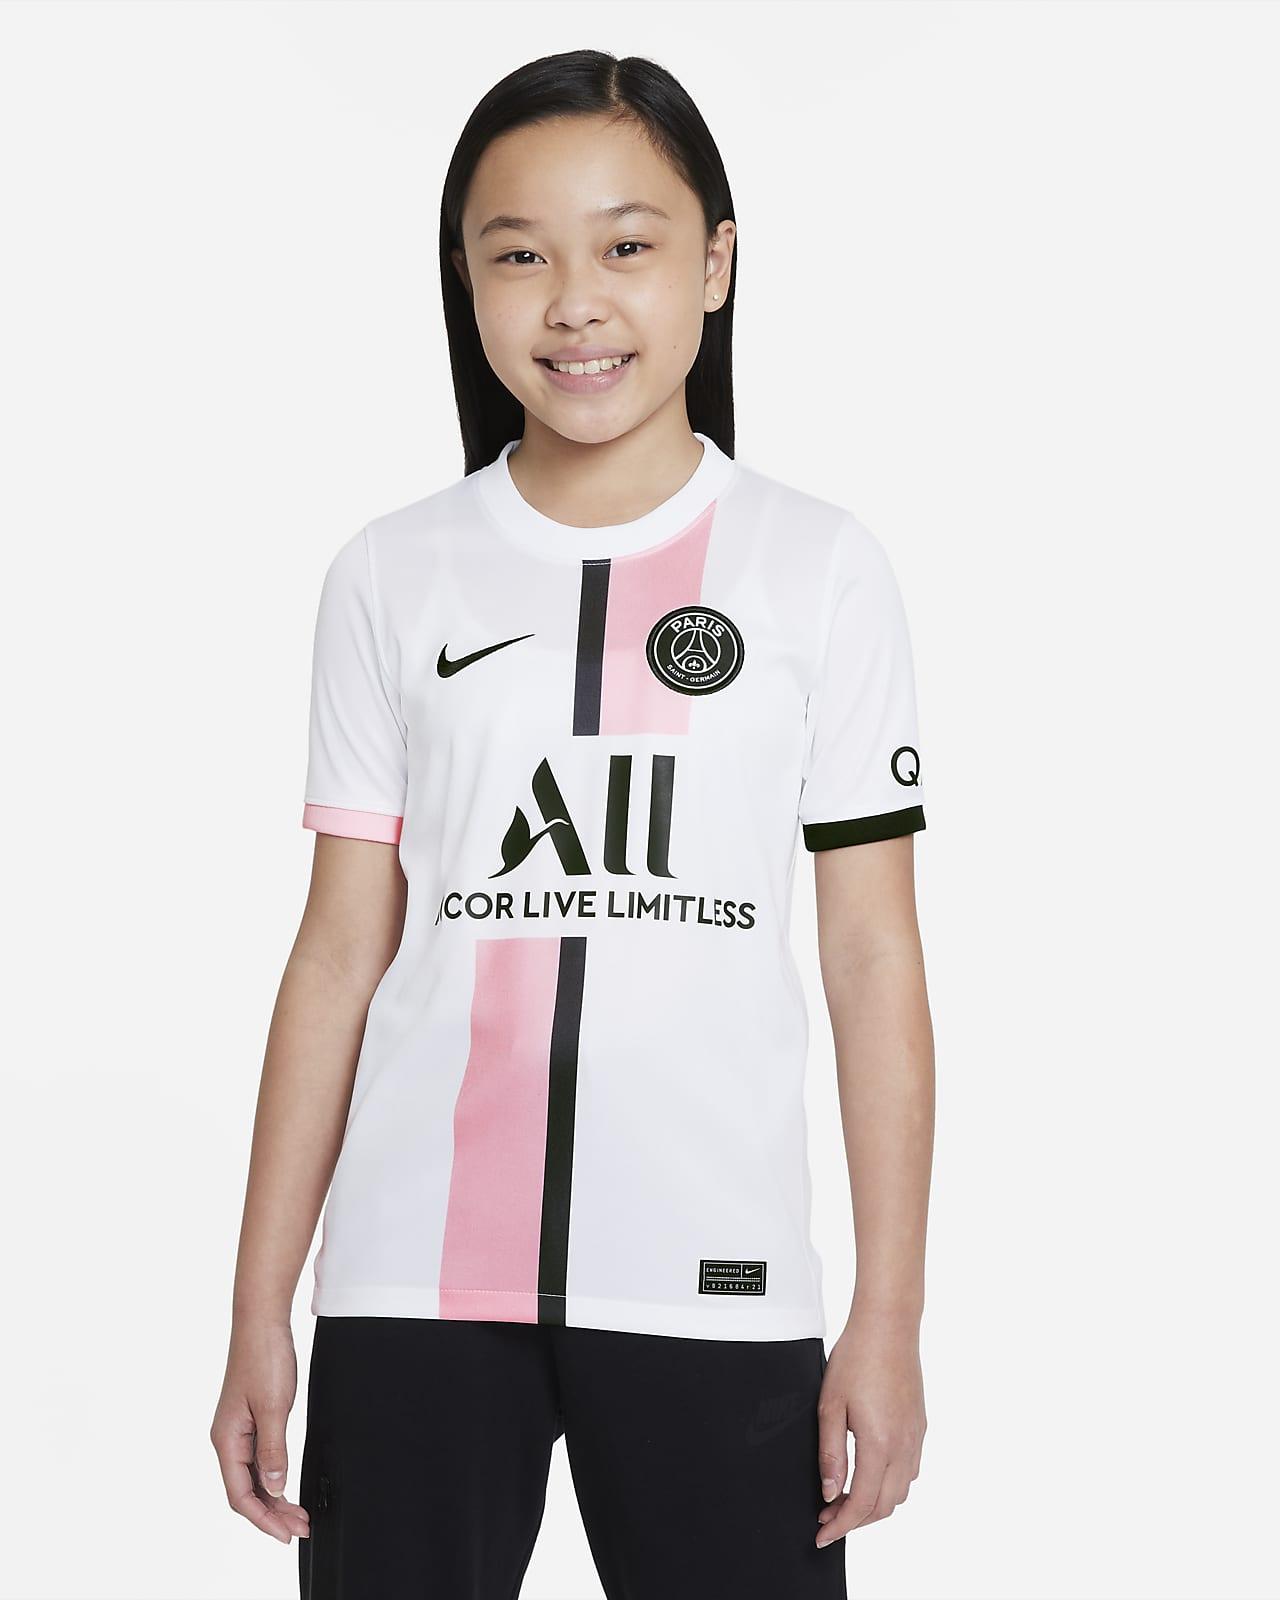 Paris Saint-Germain 2021/22 Stadium Away Older Kids' Nike Dri-FIT Football Shirt